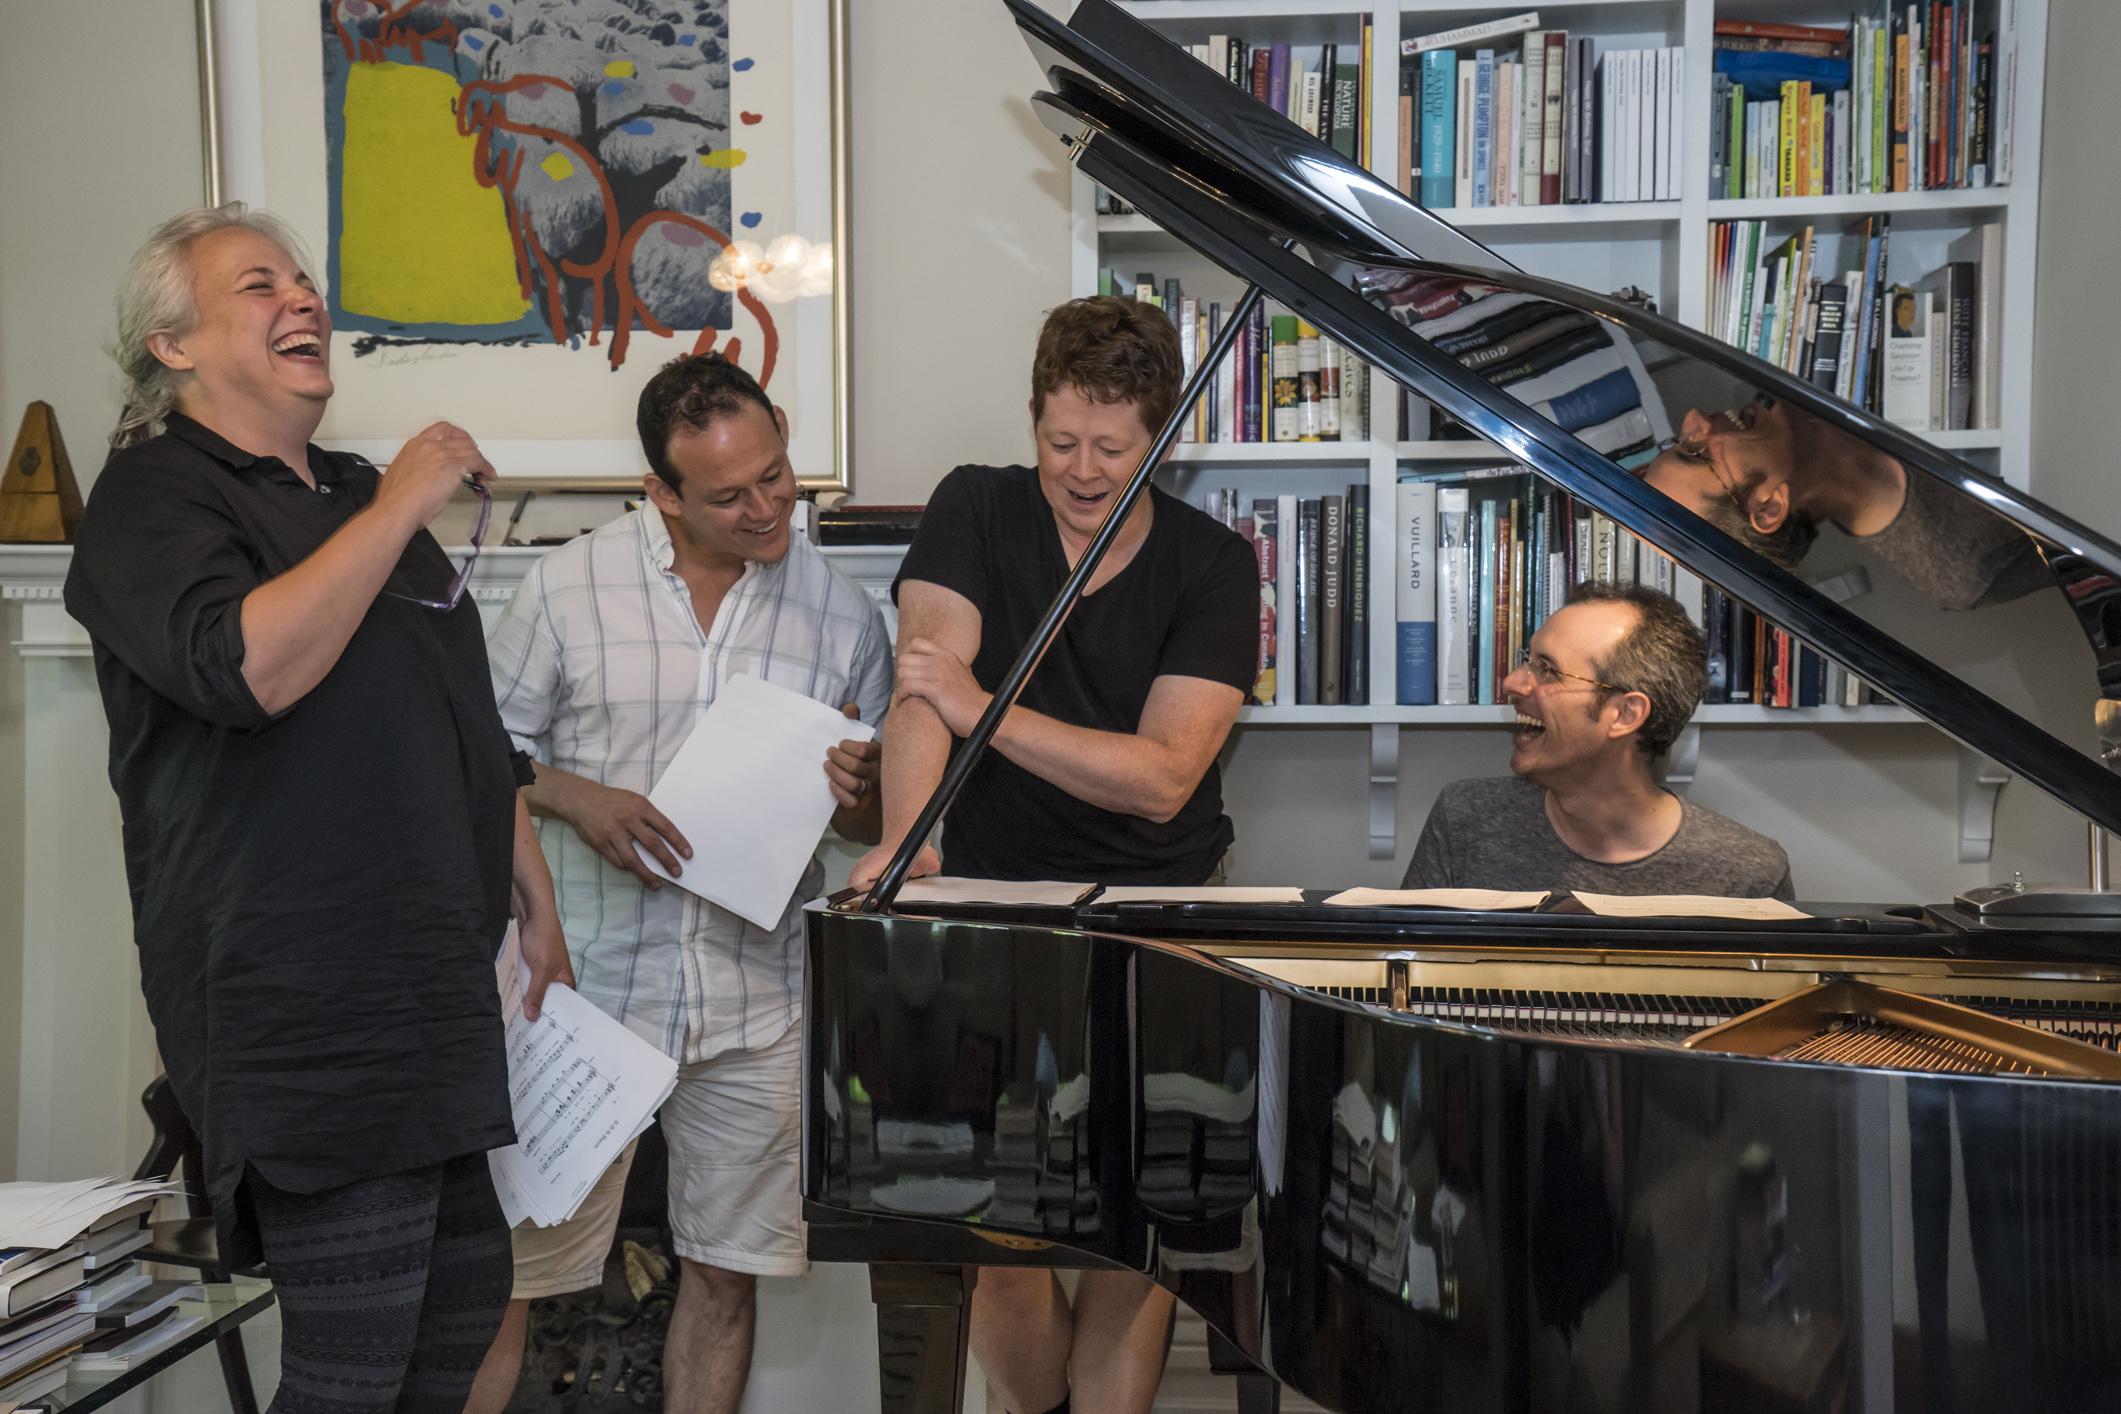 The cast of   UBU MAYOR   by Adam Seelig, Sep 12-21, 2014 at the Wychwood Theatre in Toronto. Left-right:  Astrid Van Wieren  (Huhu),  Michael Dufays  (Dudu),  Richard Harte  (Ubu),  Adam Seelig  (piano). Photo: Yuri Dojc.